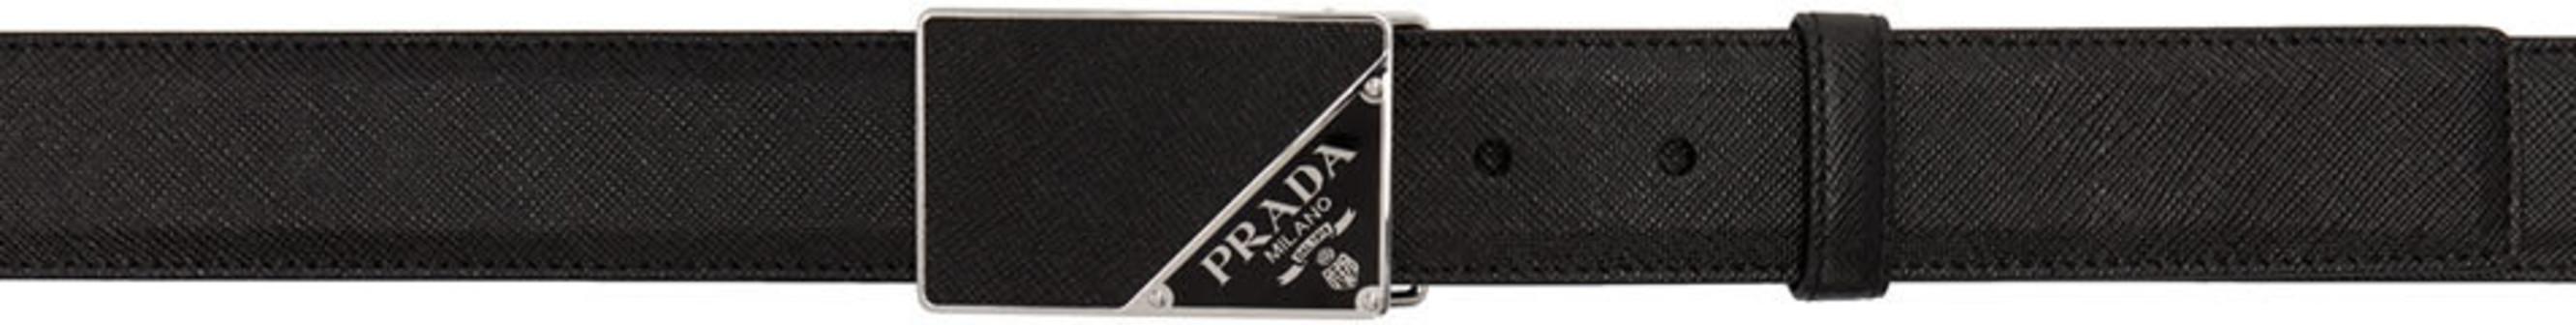 9ded62ffe1a4bf Prada for Men SS19 Collection | SSENSE